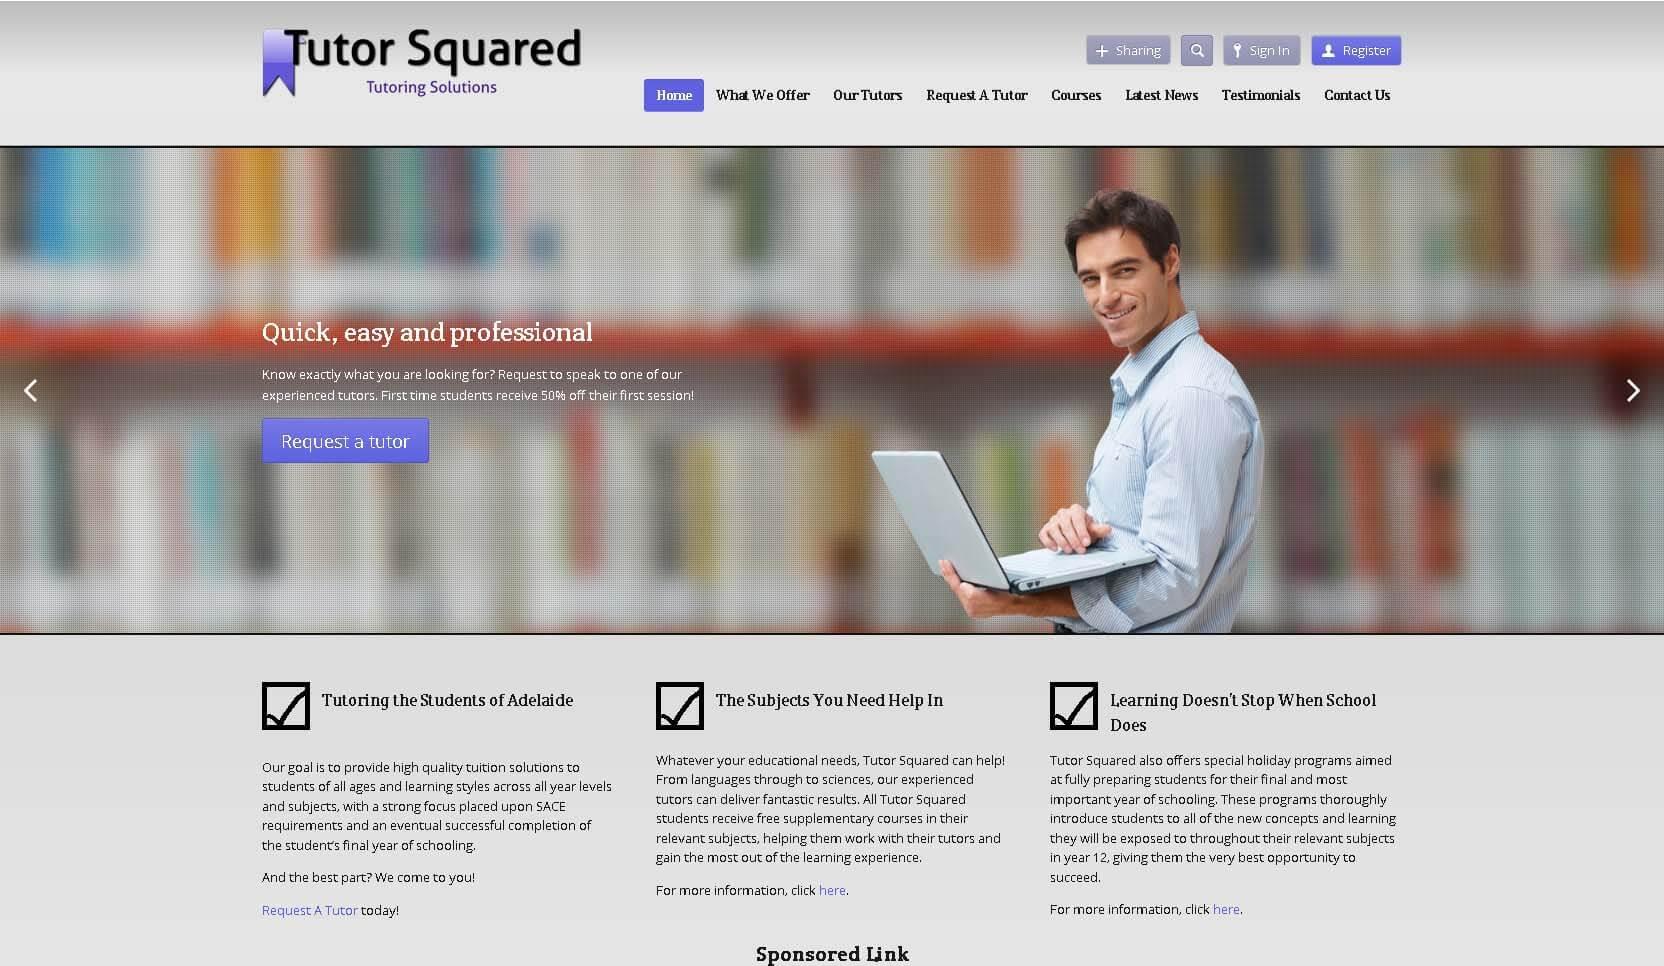 screenshot of Tutor Squared website